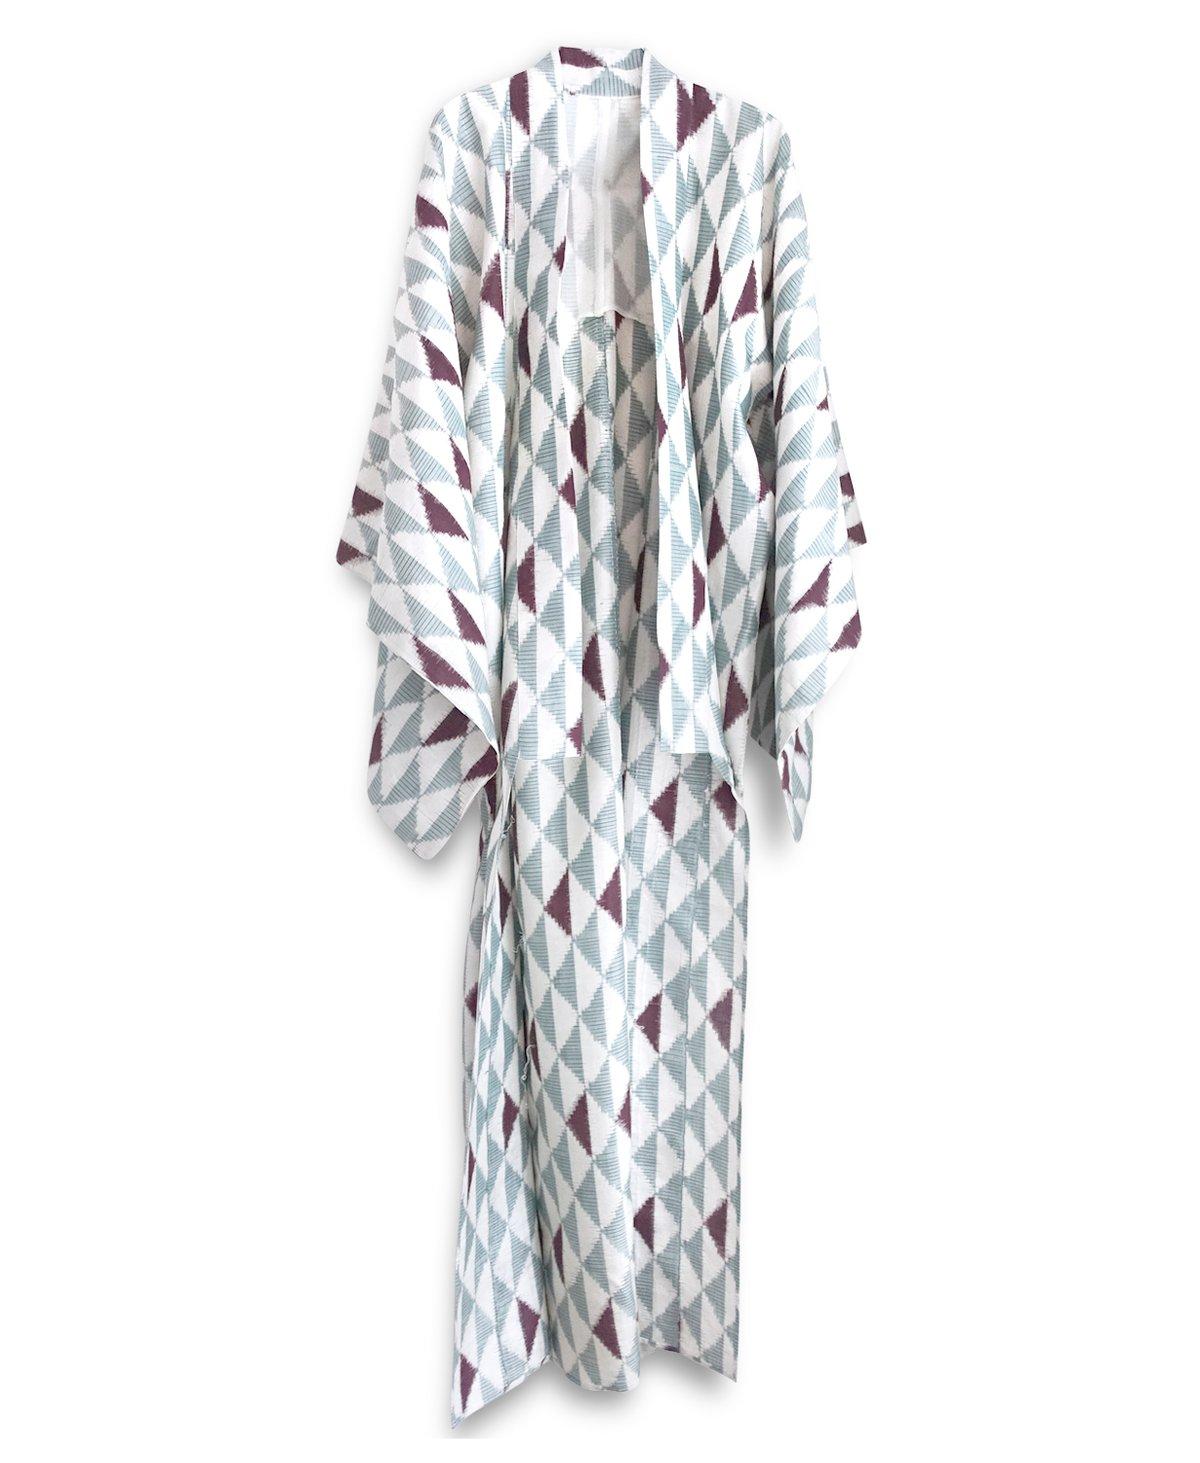 Image of Ikatvævet silke kimono - råhvid /grå/ bordeaux farvede felter